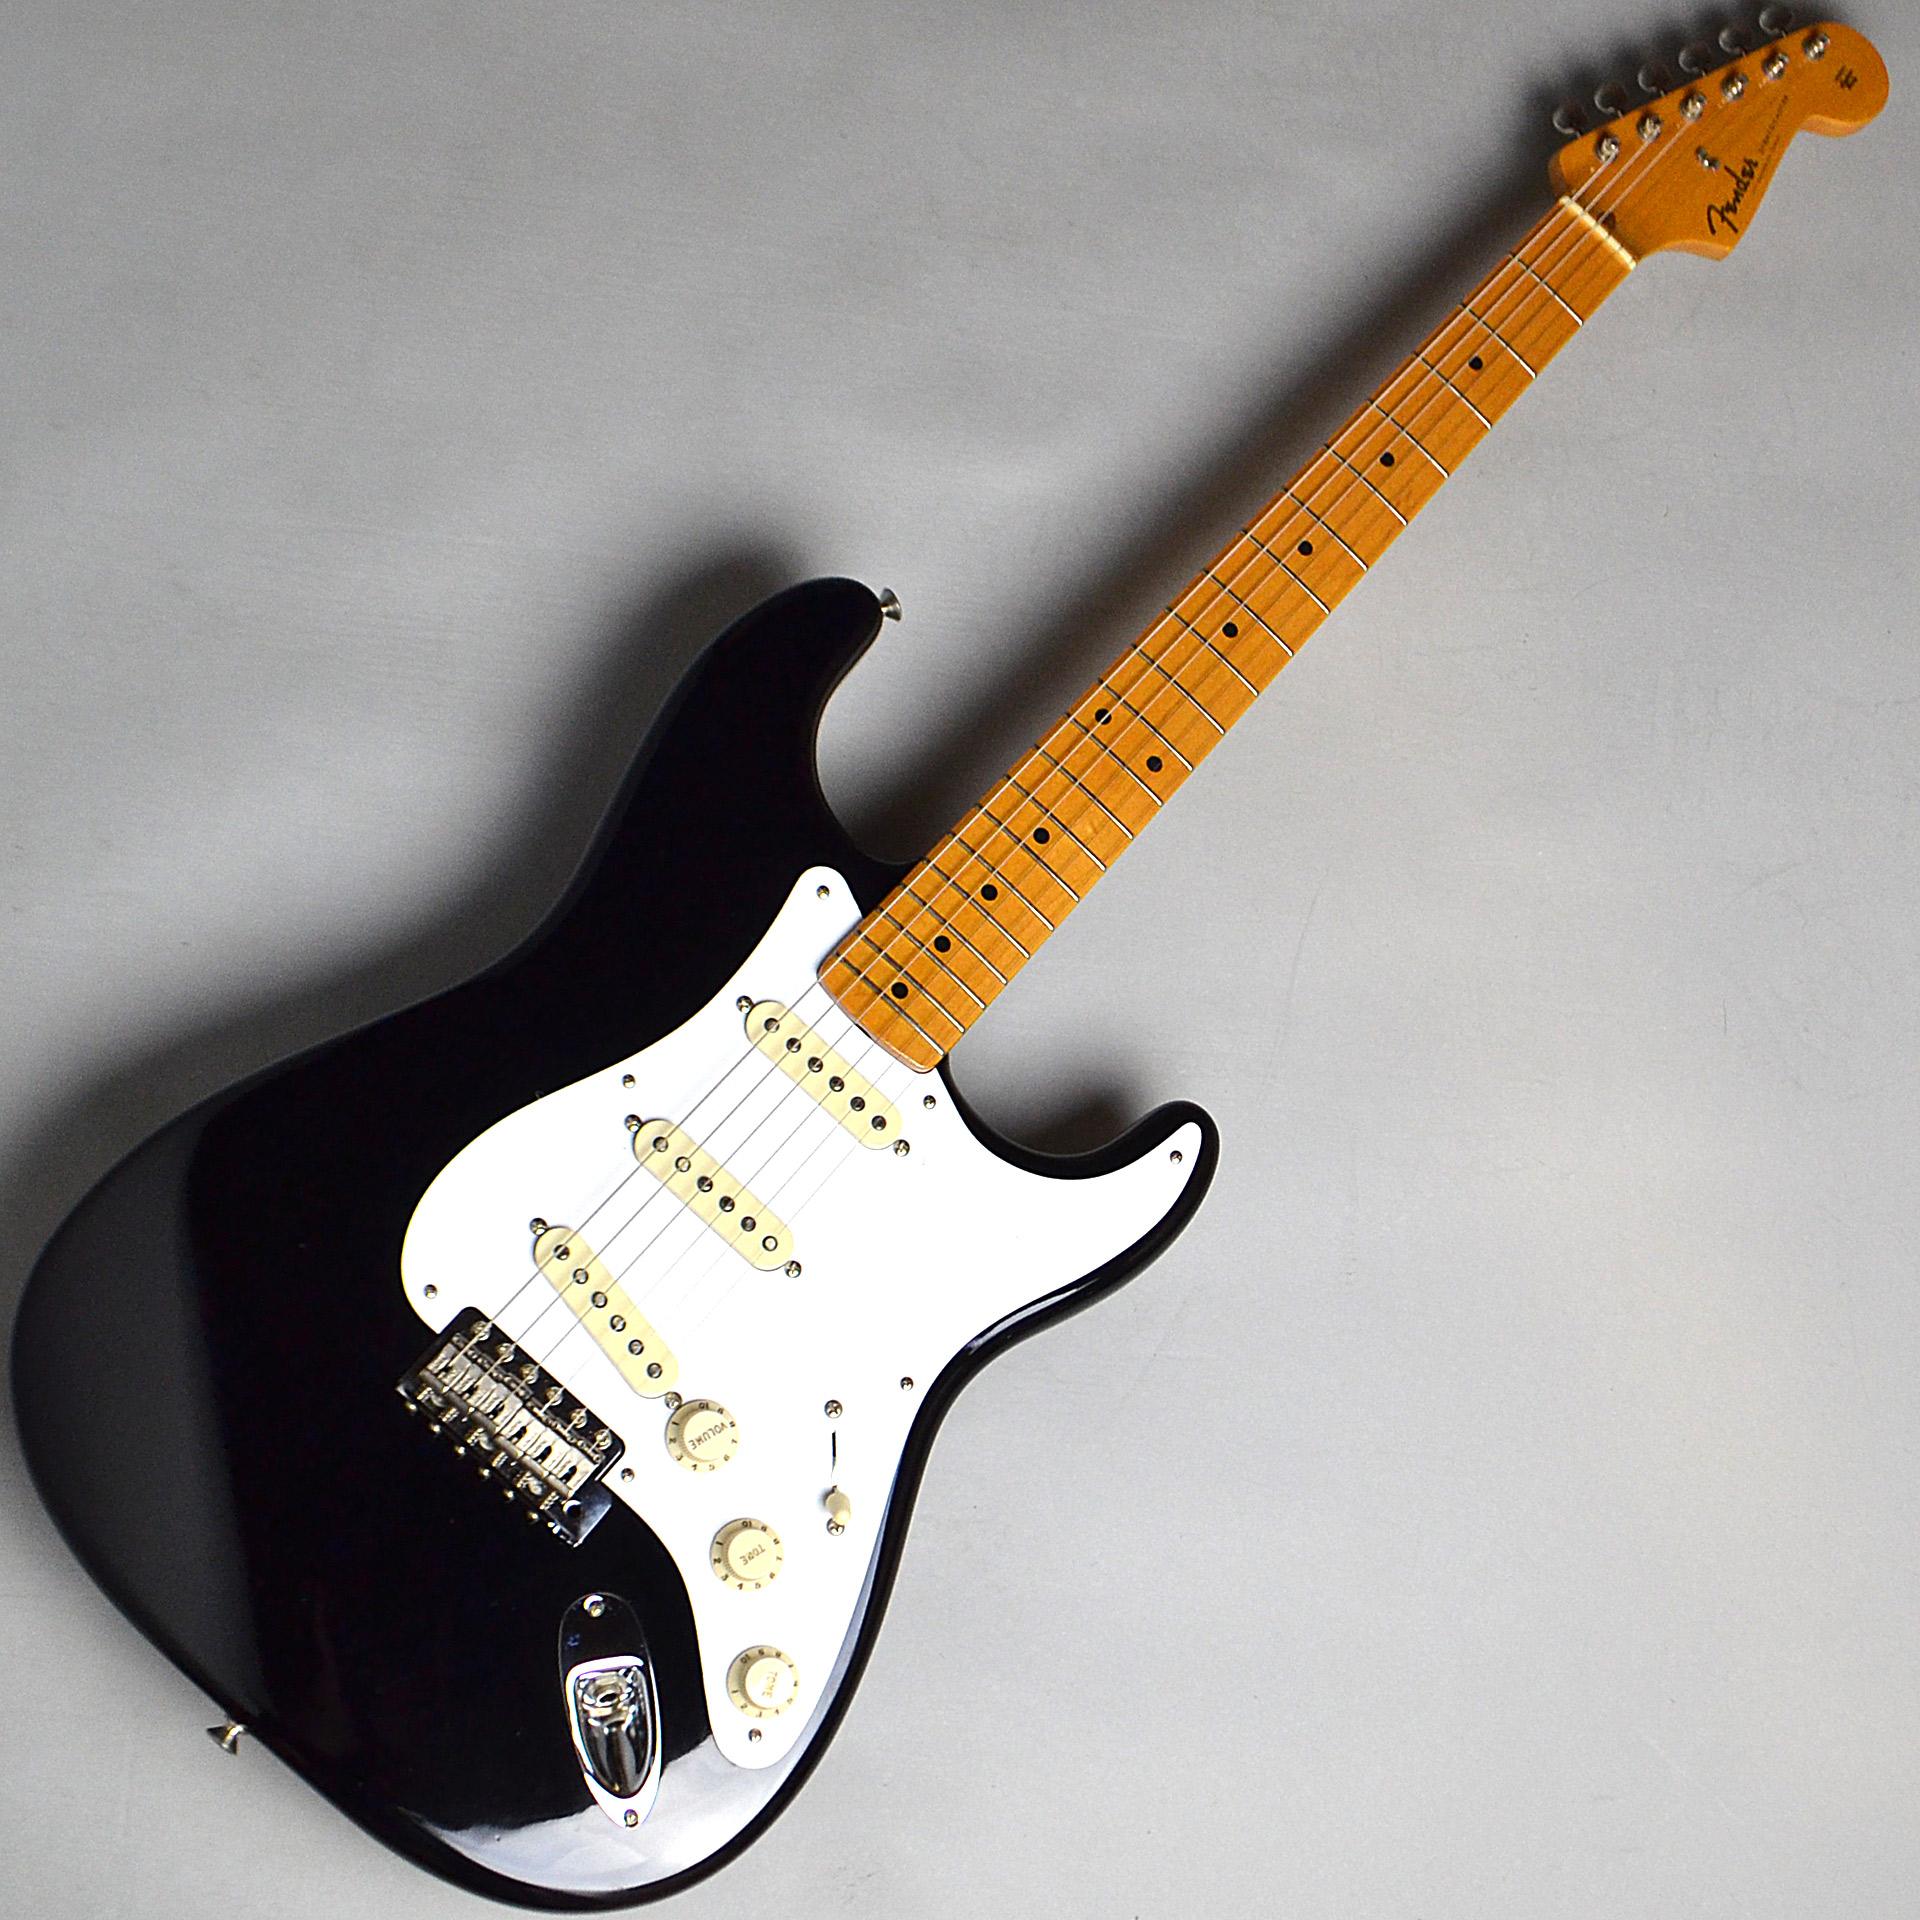 American Vintage '57 Stratocasterのボディトップ-アップ画像